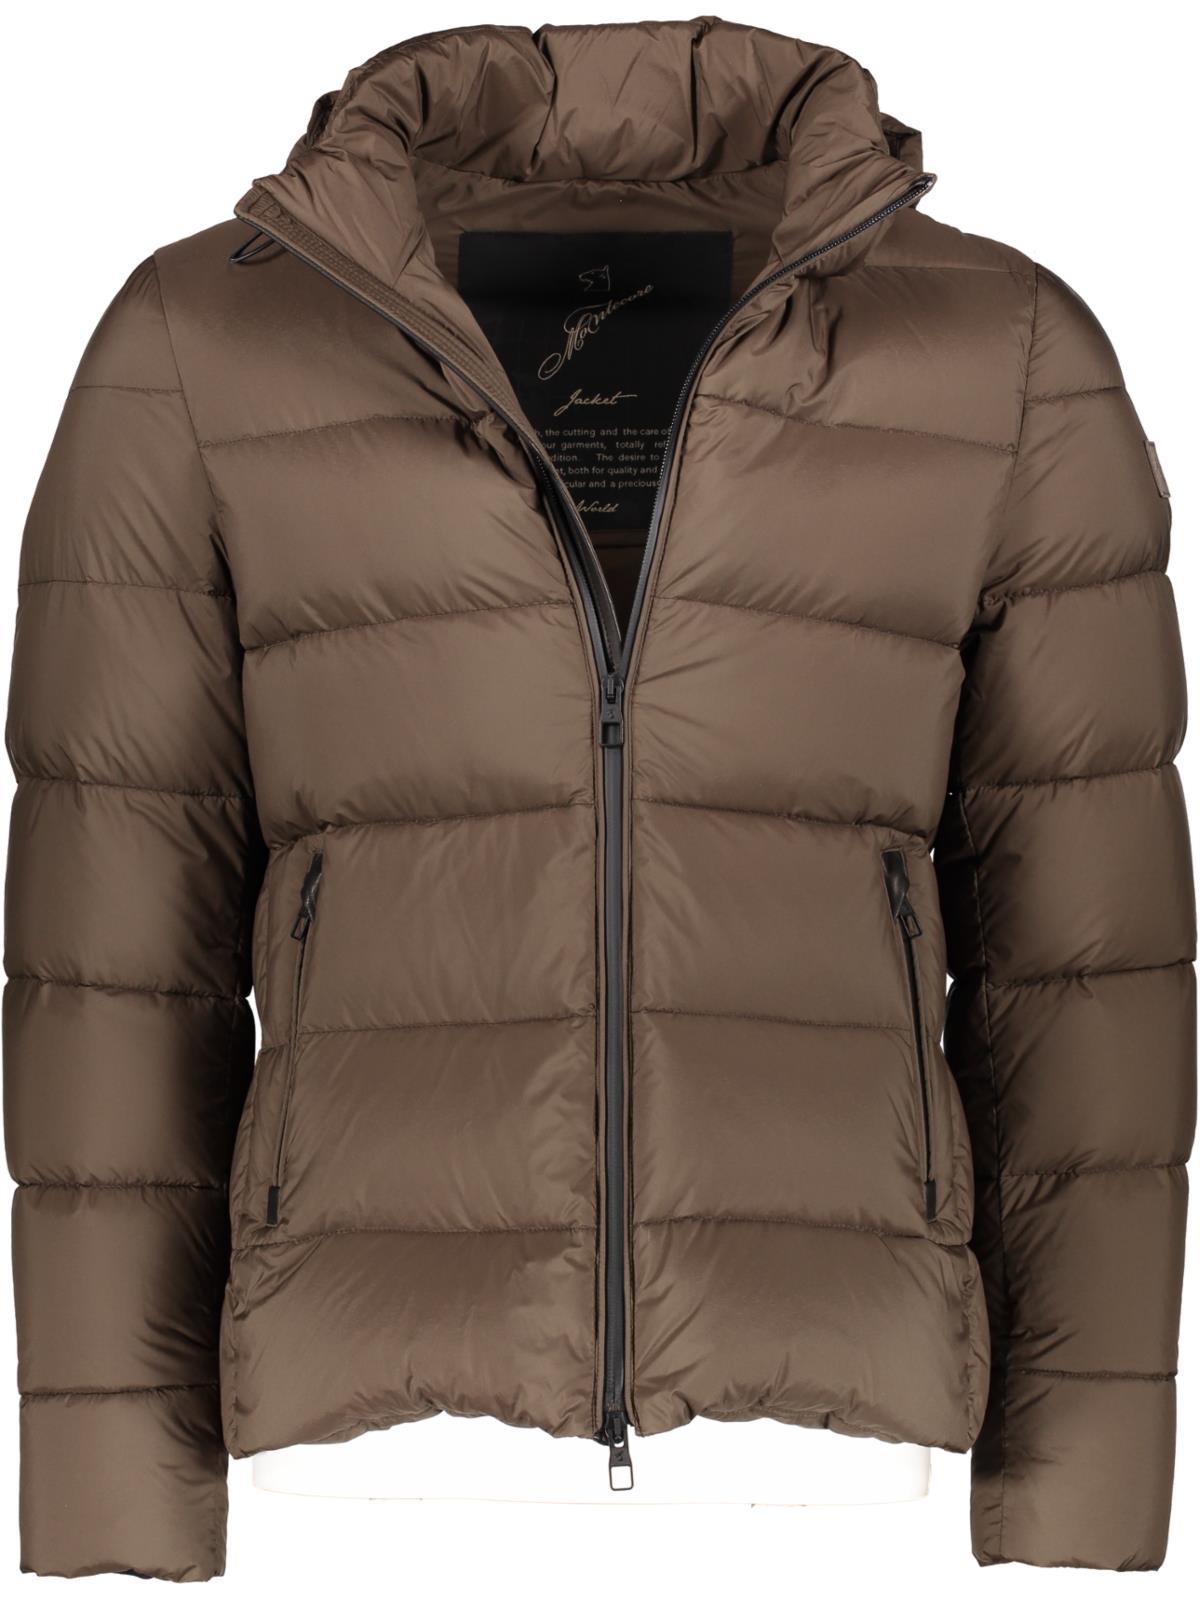 new style 3c06c 20901 Montecore Piumino 2320dx245c 172521 | Lombardi Moda